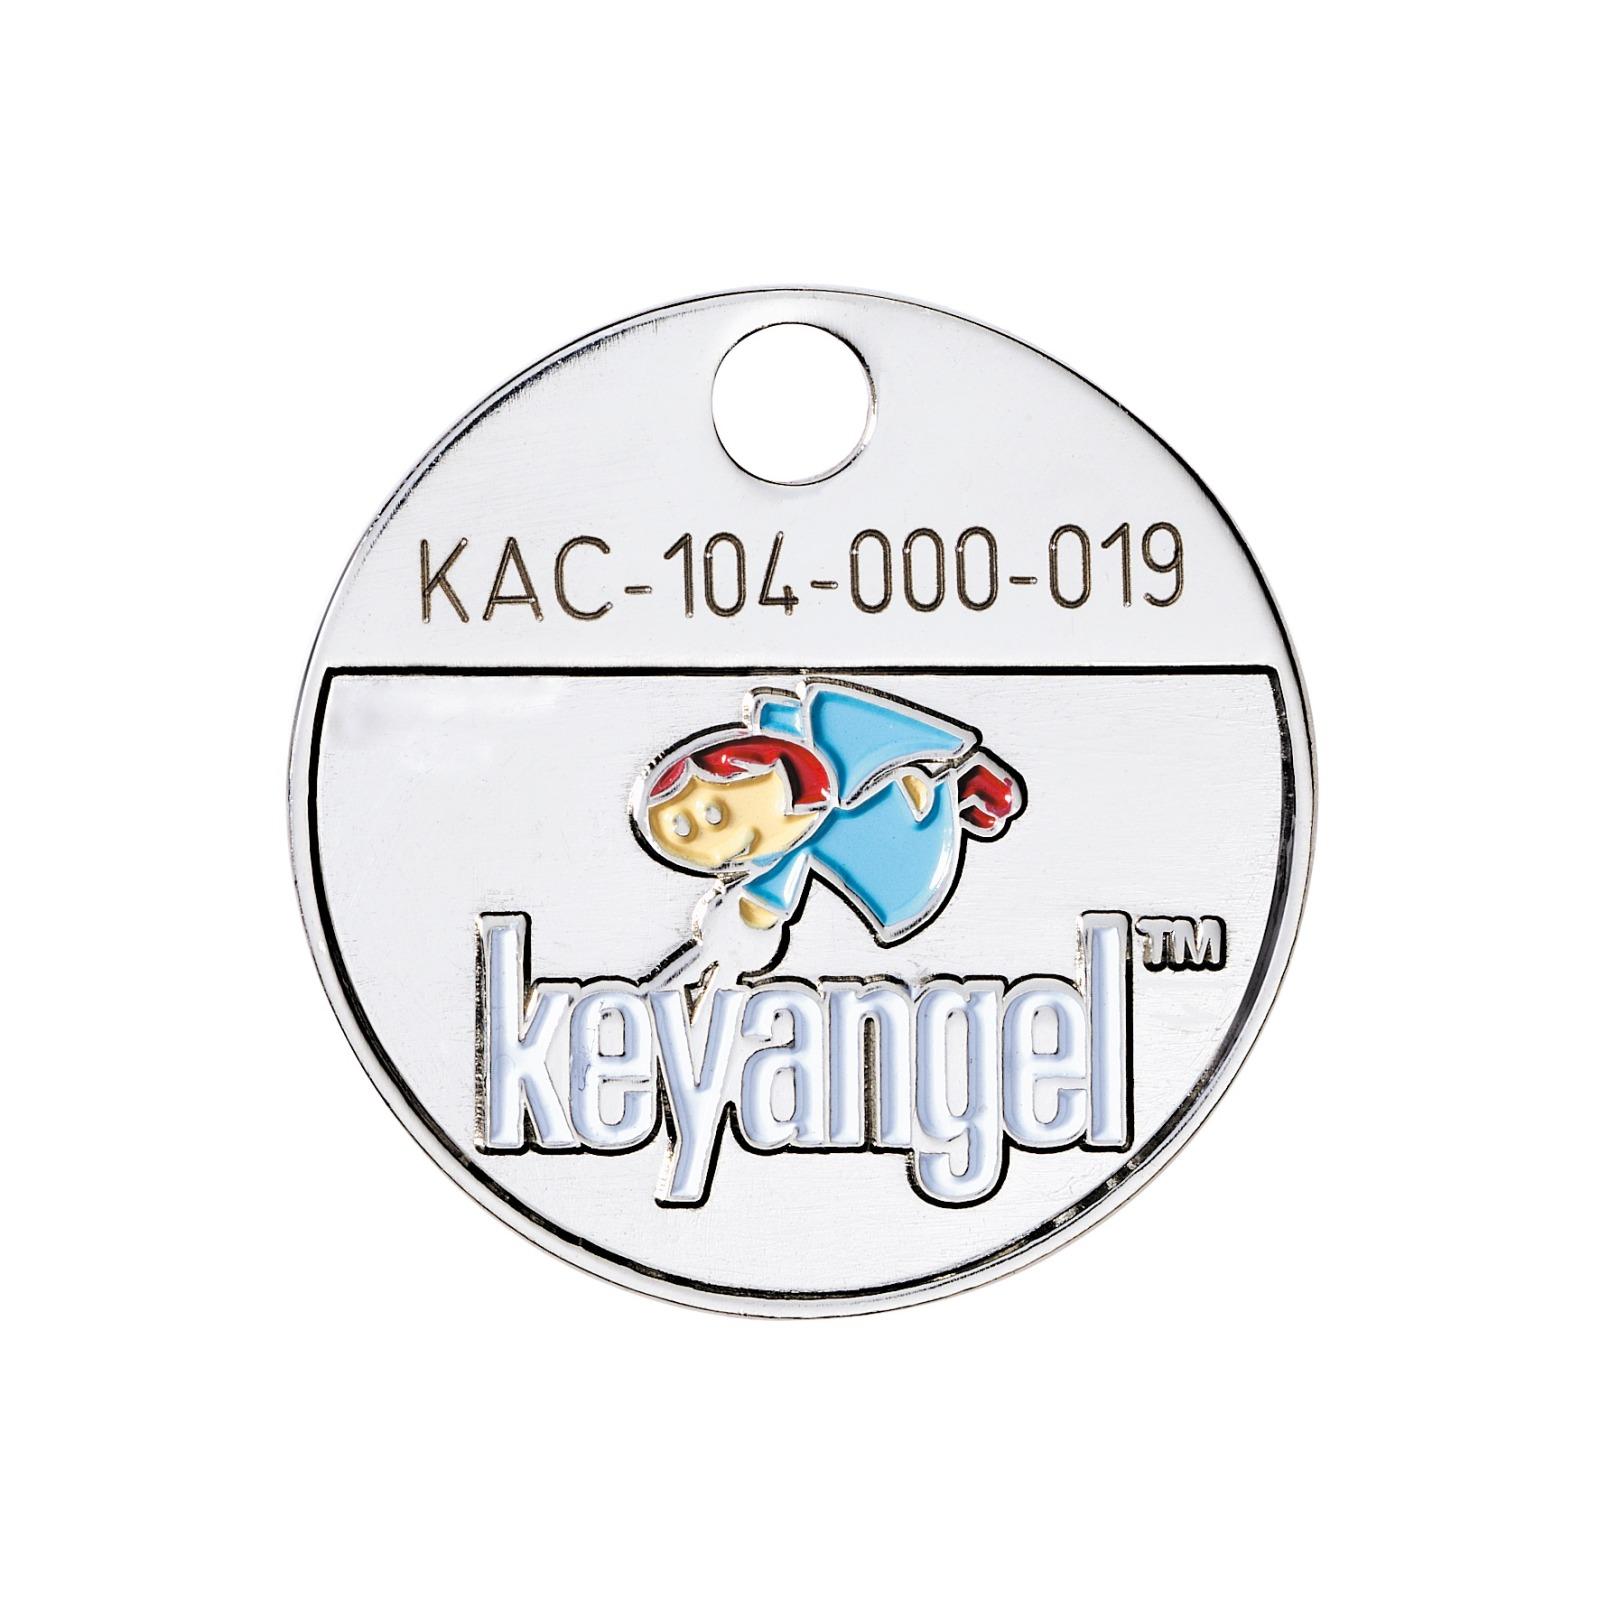 KeyAngel 3 - 2